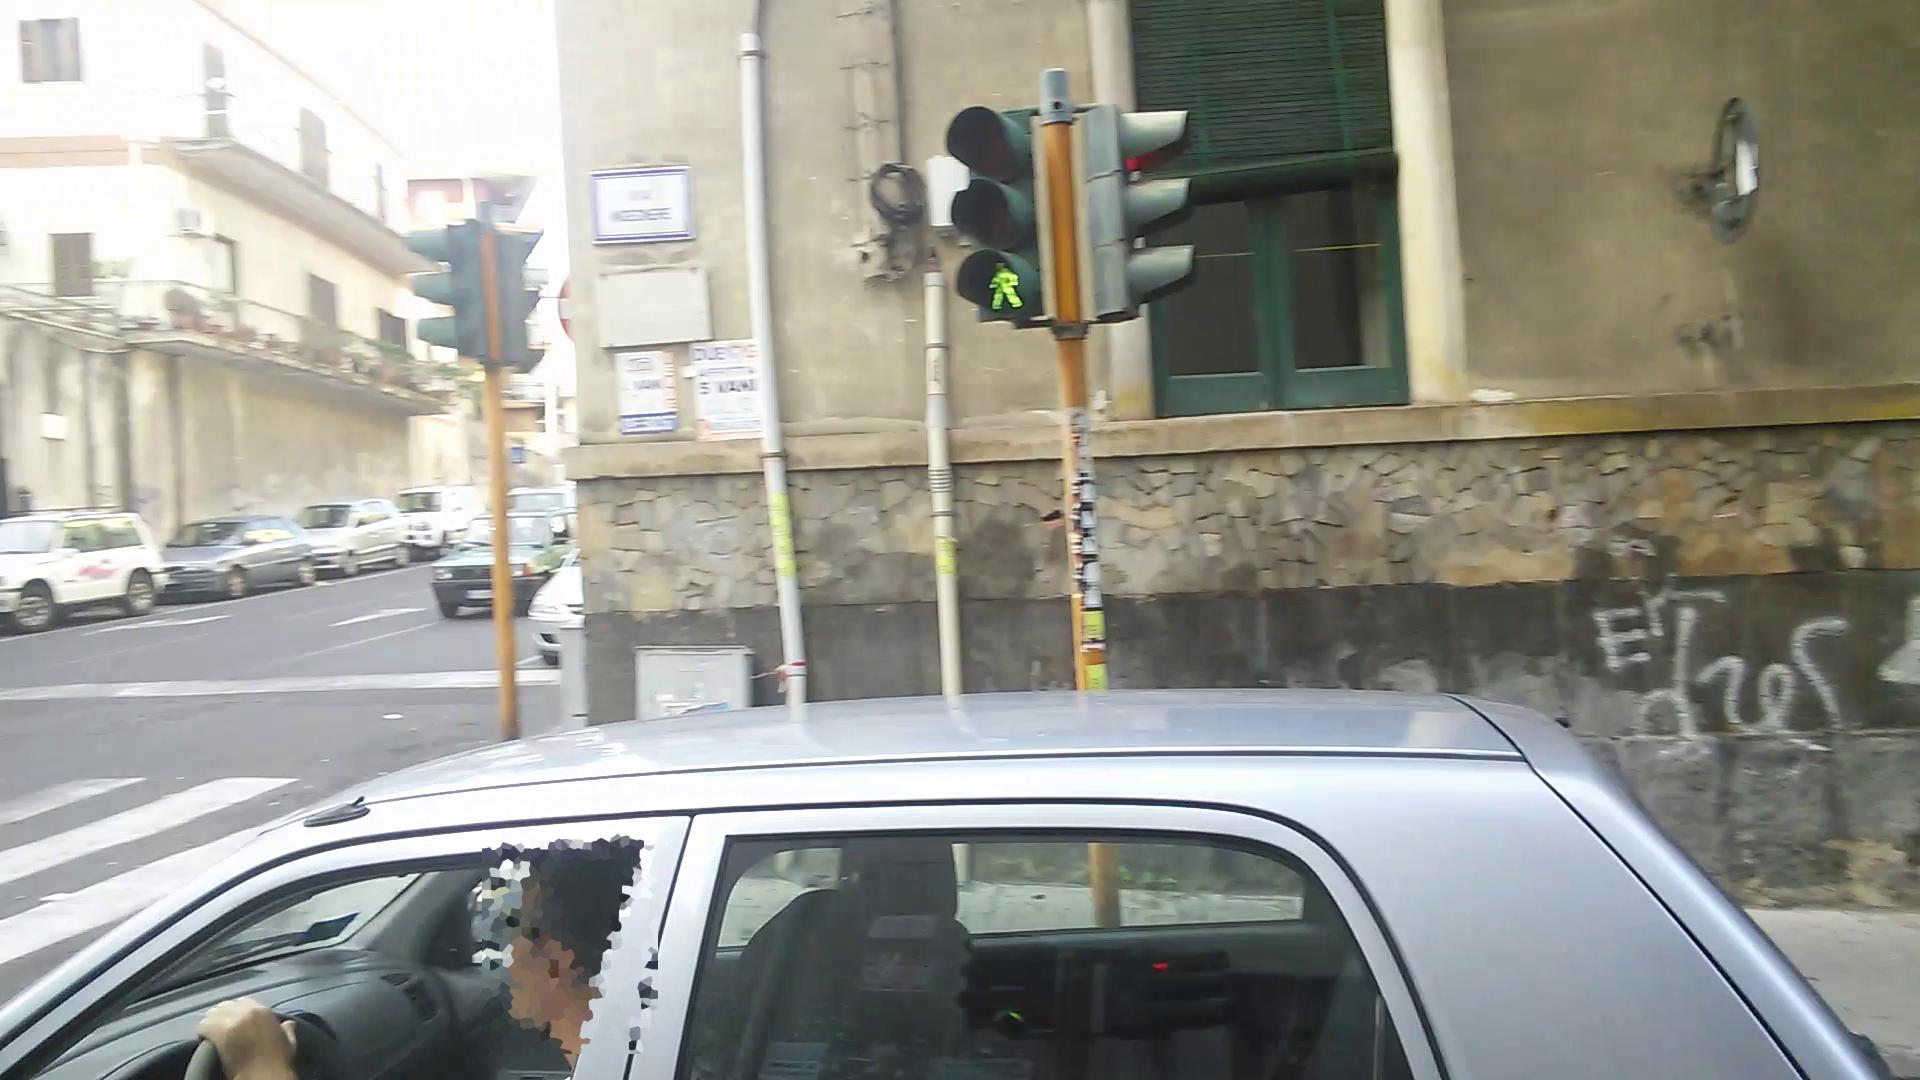 09_stop_semaforo_rosso_strisce_inmezzoaipiedi_(via Passo Gravina - via Ingegnere)